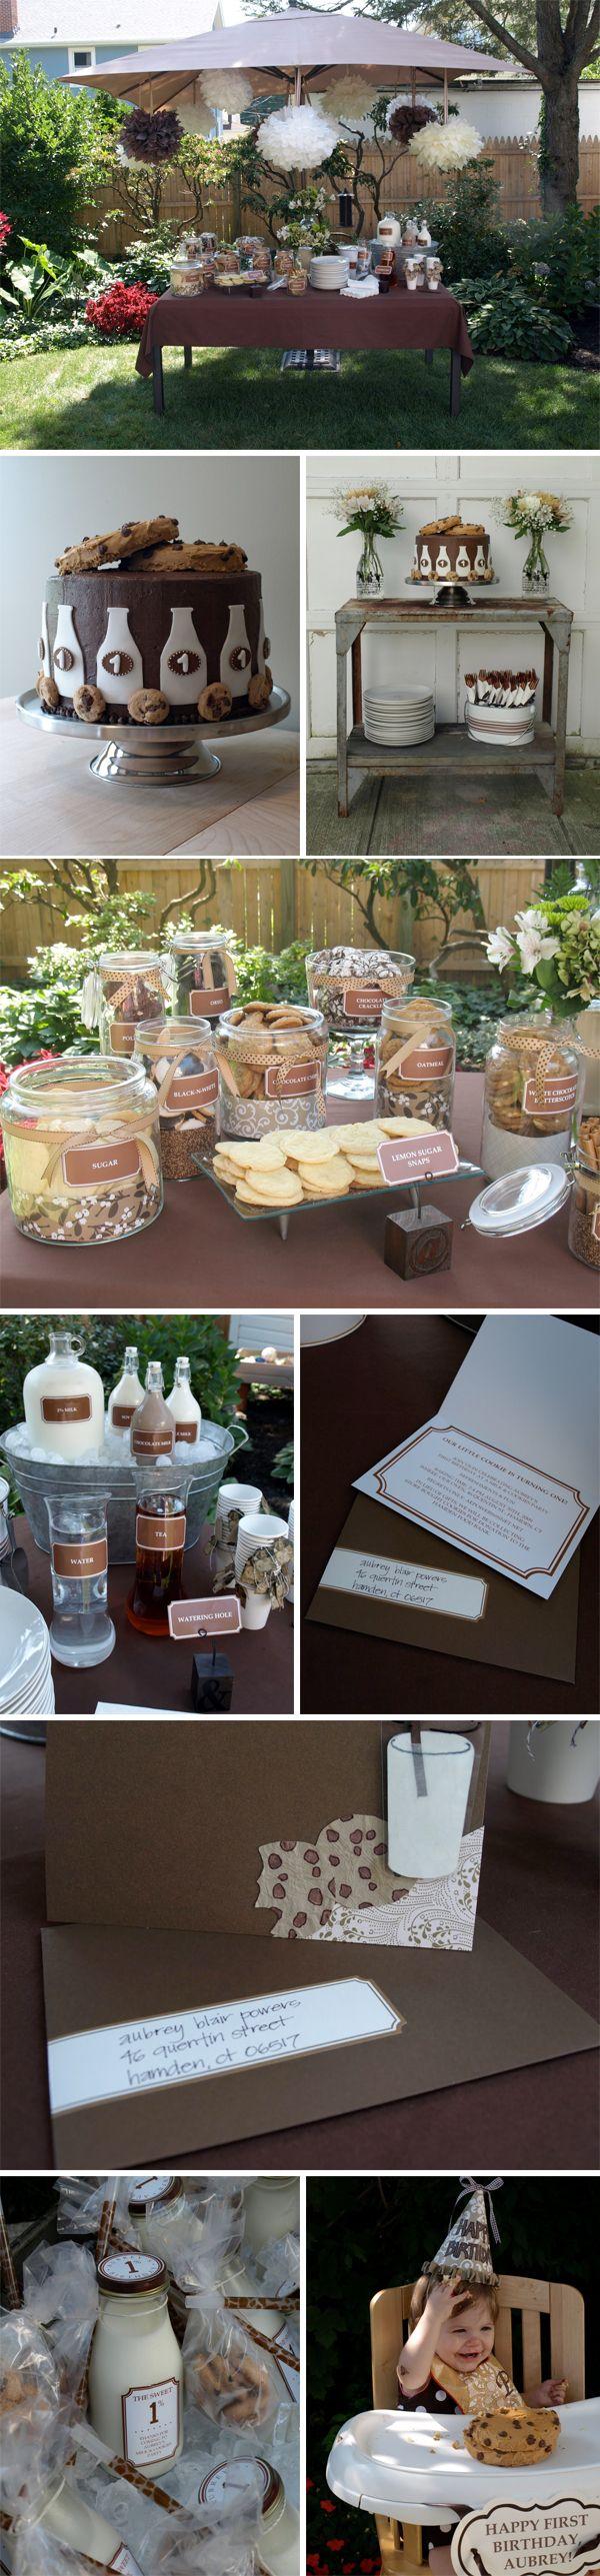 Cookies & Milk party: Cookies Parties, Birthday Parties, 1St Birthday, Milk And Cookies, Parties Ideas, Parties Theme, Milk Parties, Cookies Jars, Birthday Ideas